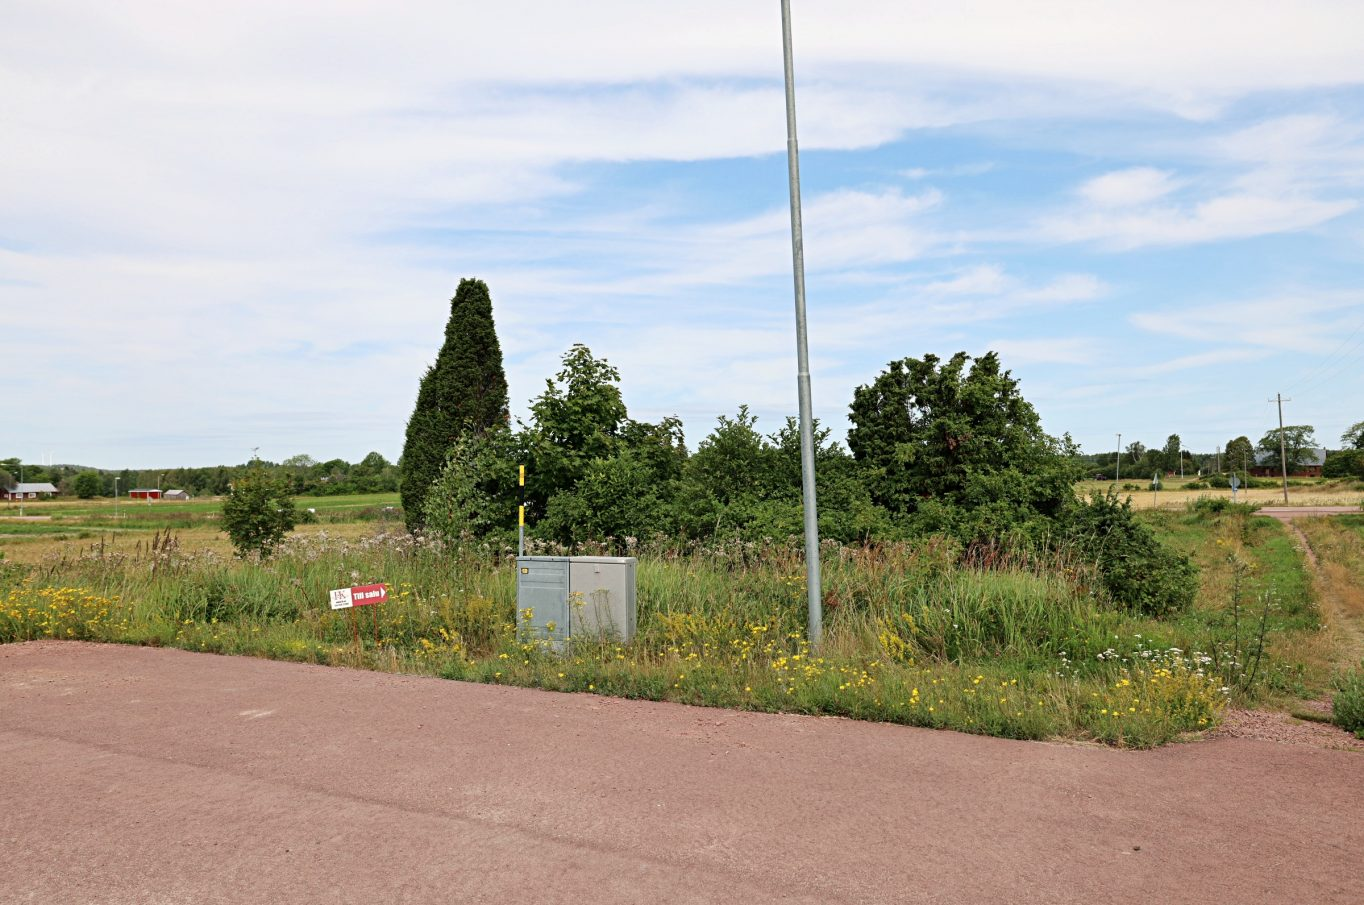 Bostadstomt nr 3 i Söderby, Lemland